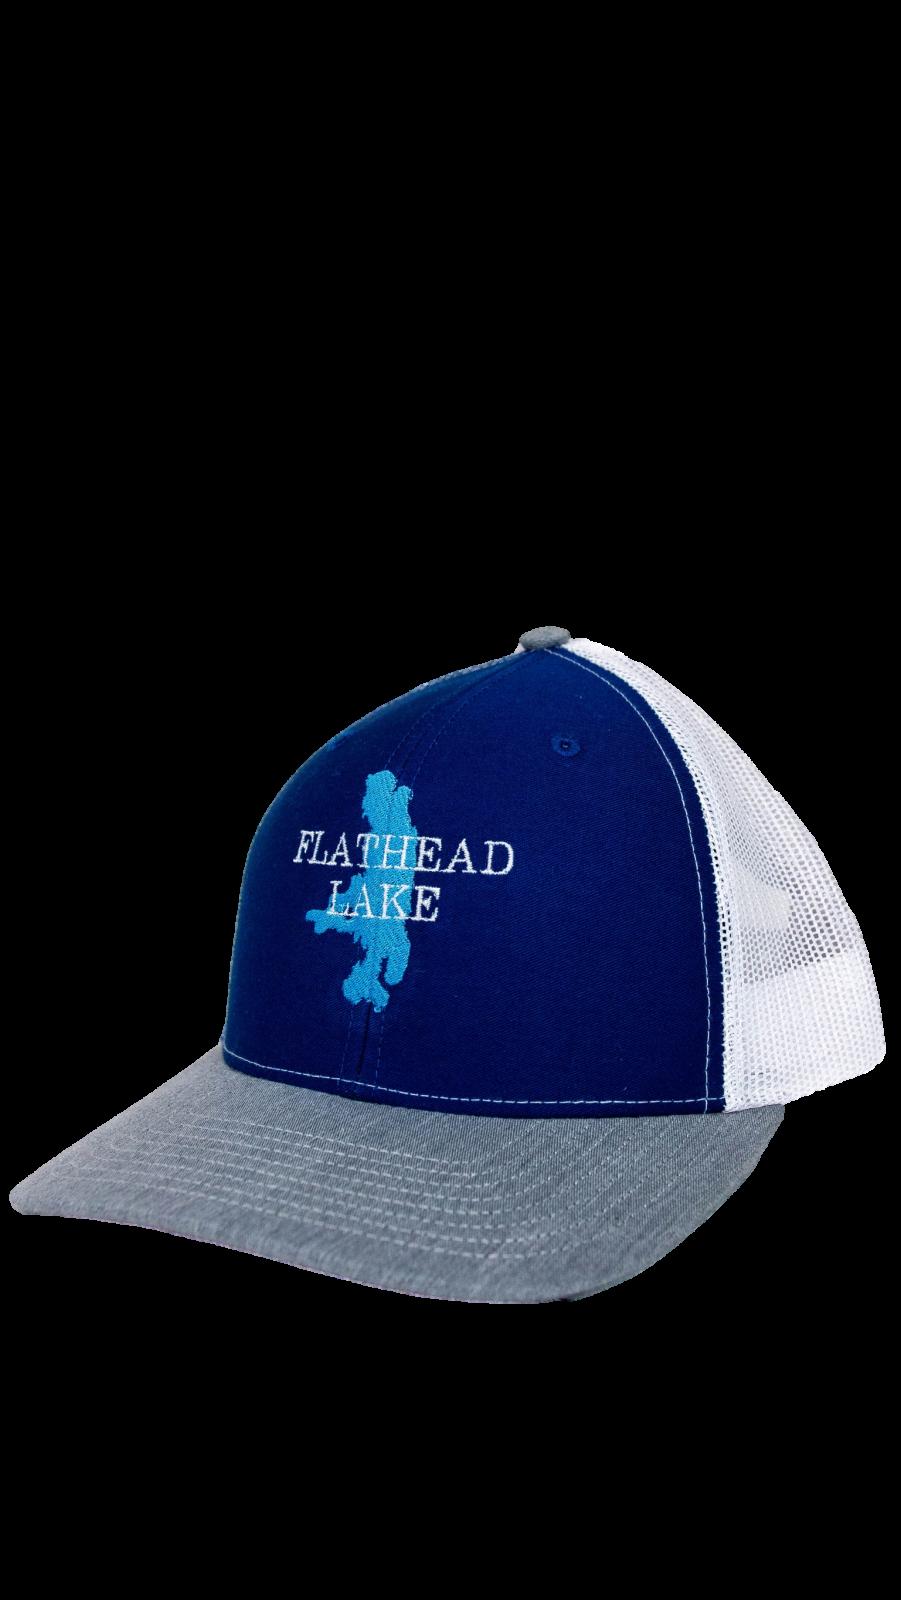 Flathead Lake Grey / Blue / White Trucker Hat